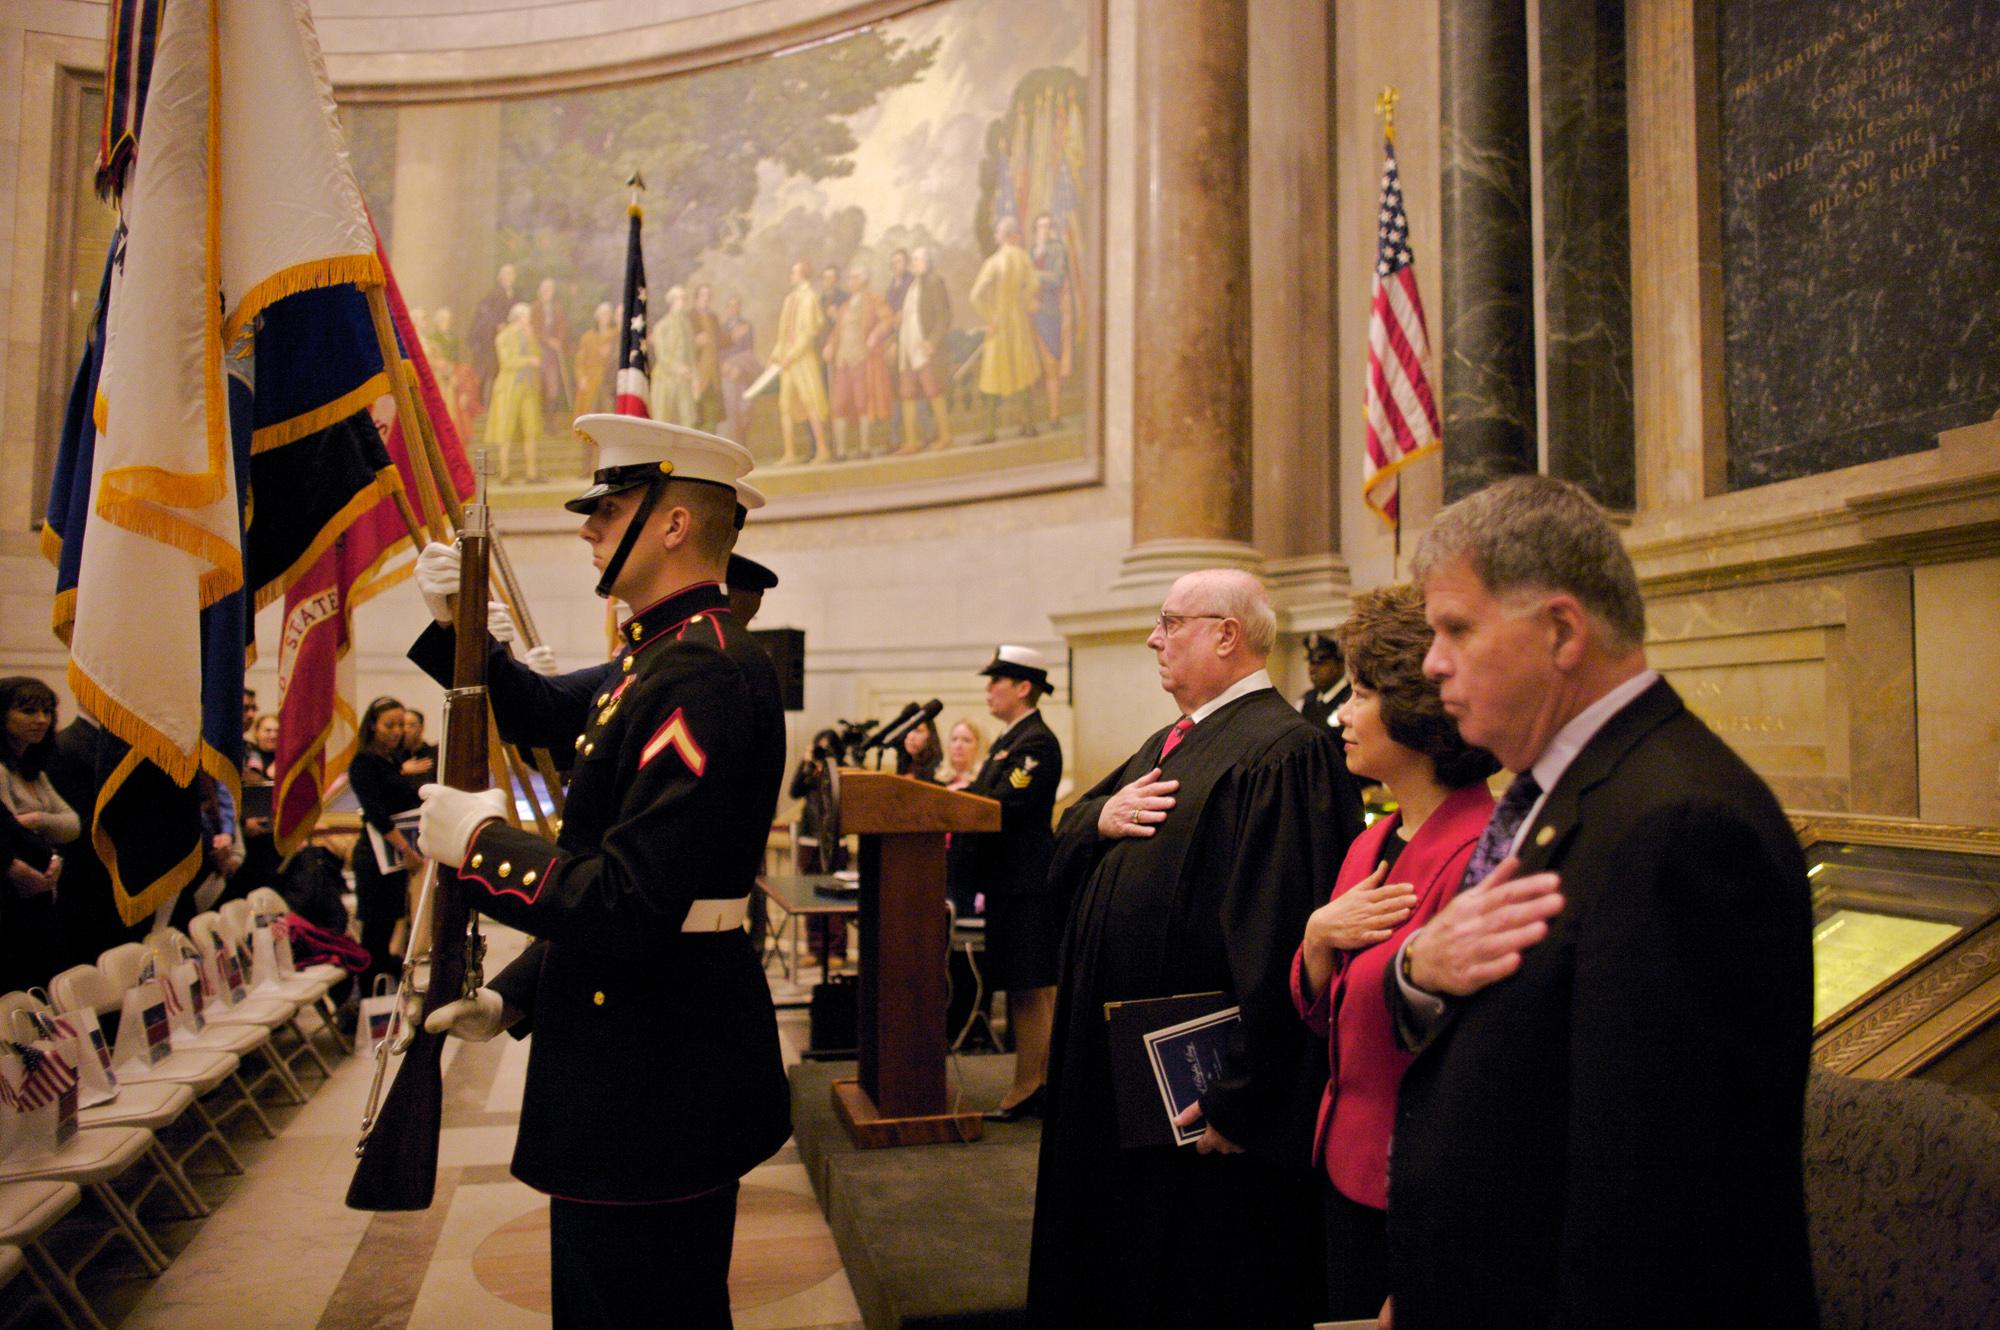 Naturalization Ceremony 2010. Archivist of the United States David S. Ferriero.